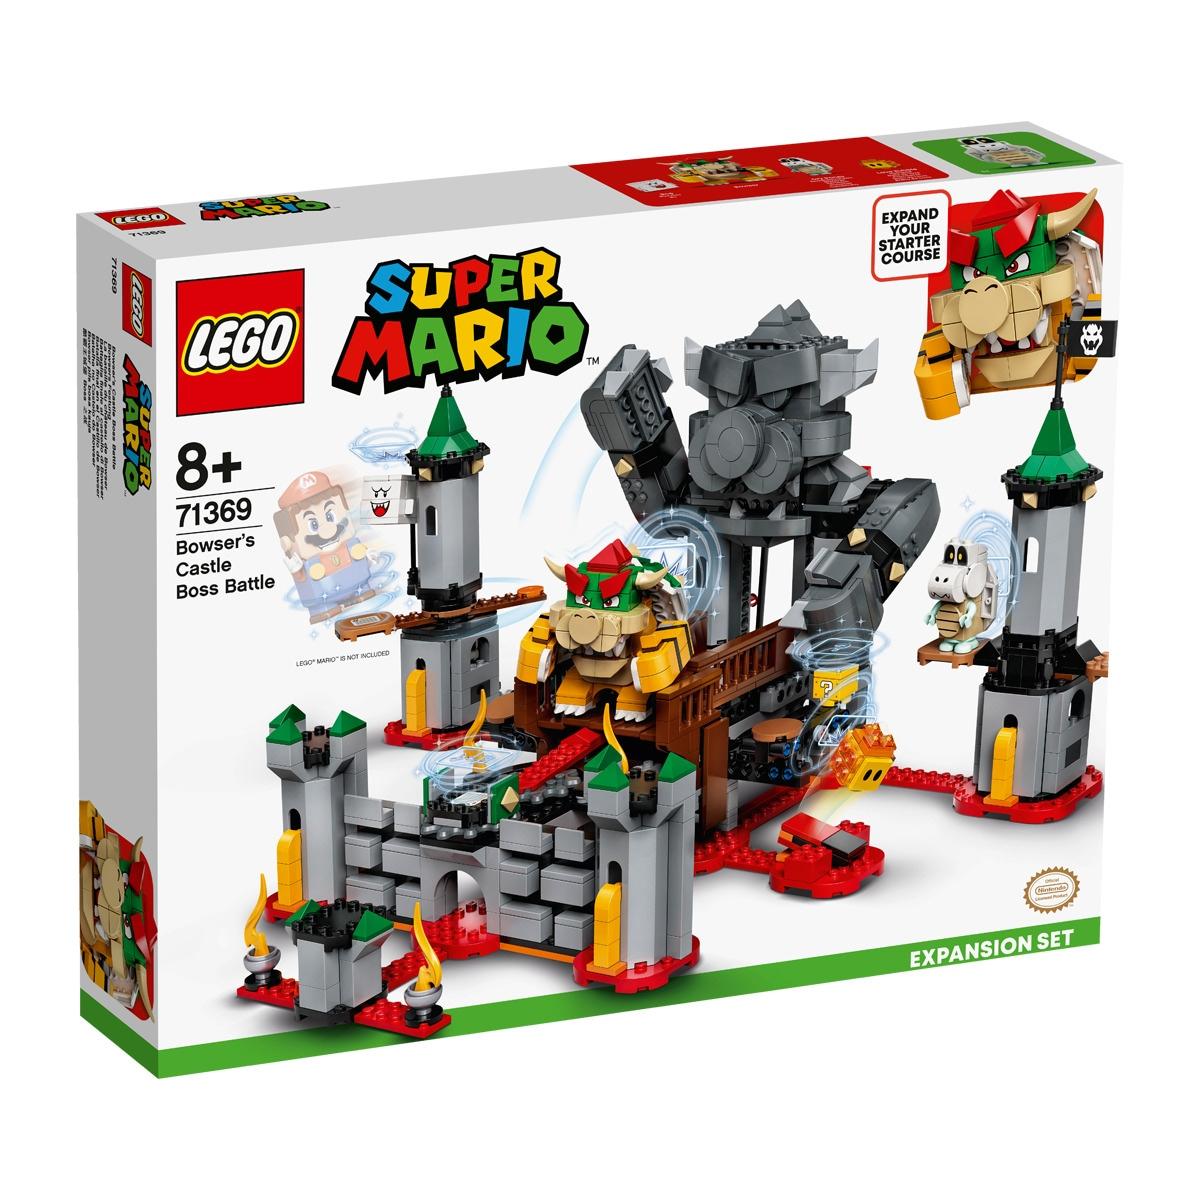 LEGO Batalla Final en el Castillo de Bowser Lego Super Mario